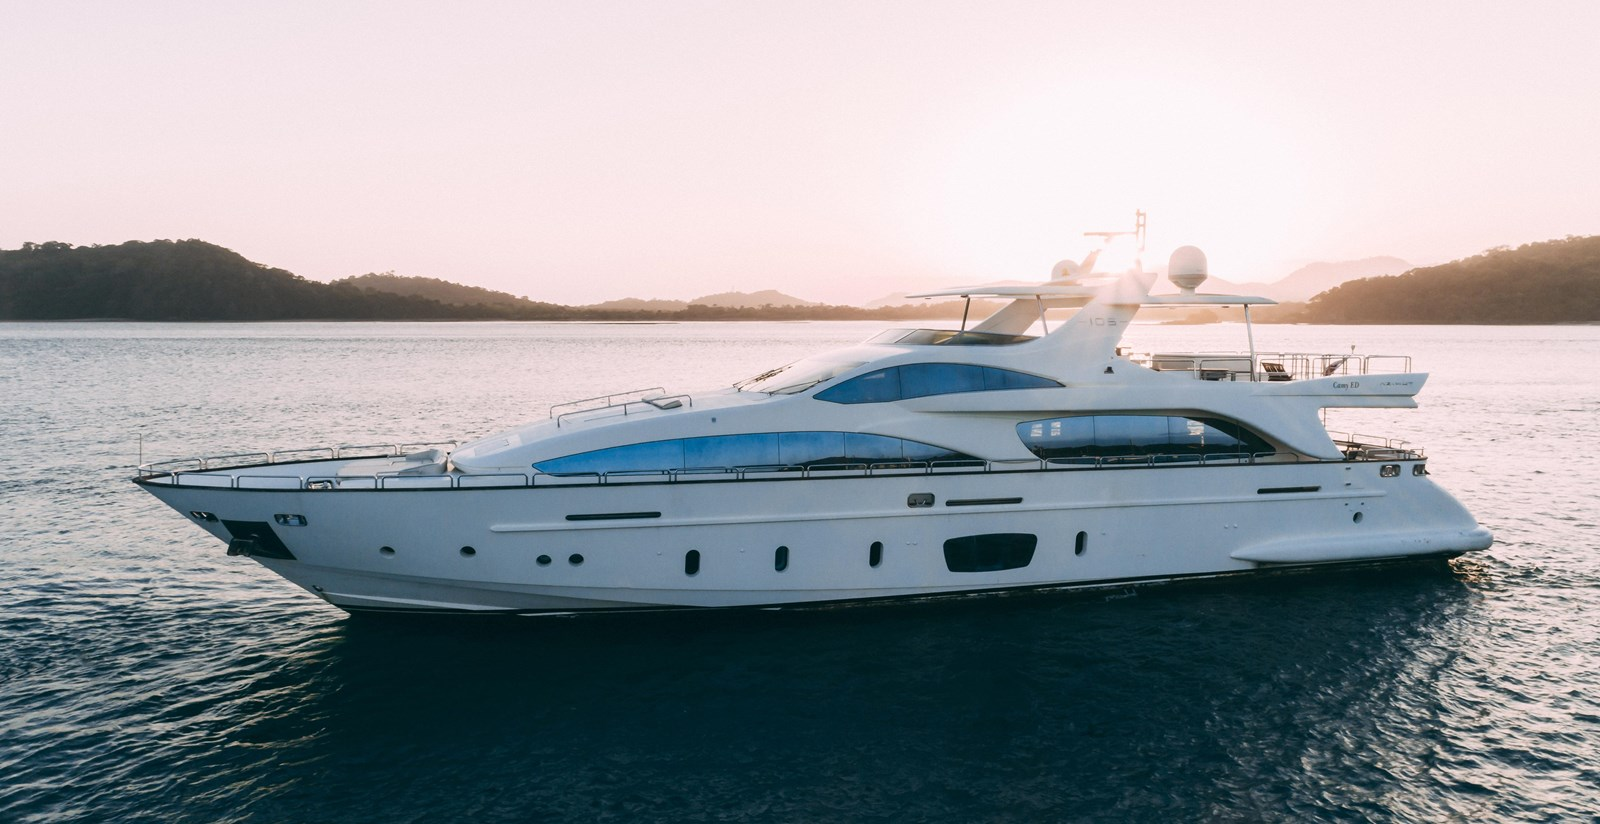 Camy ED yacht for sale